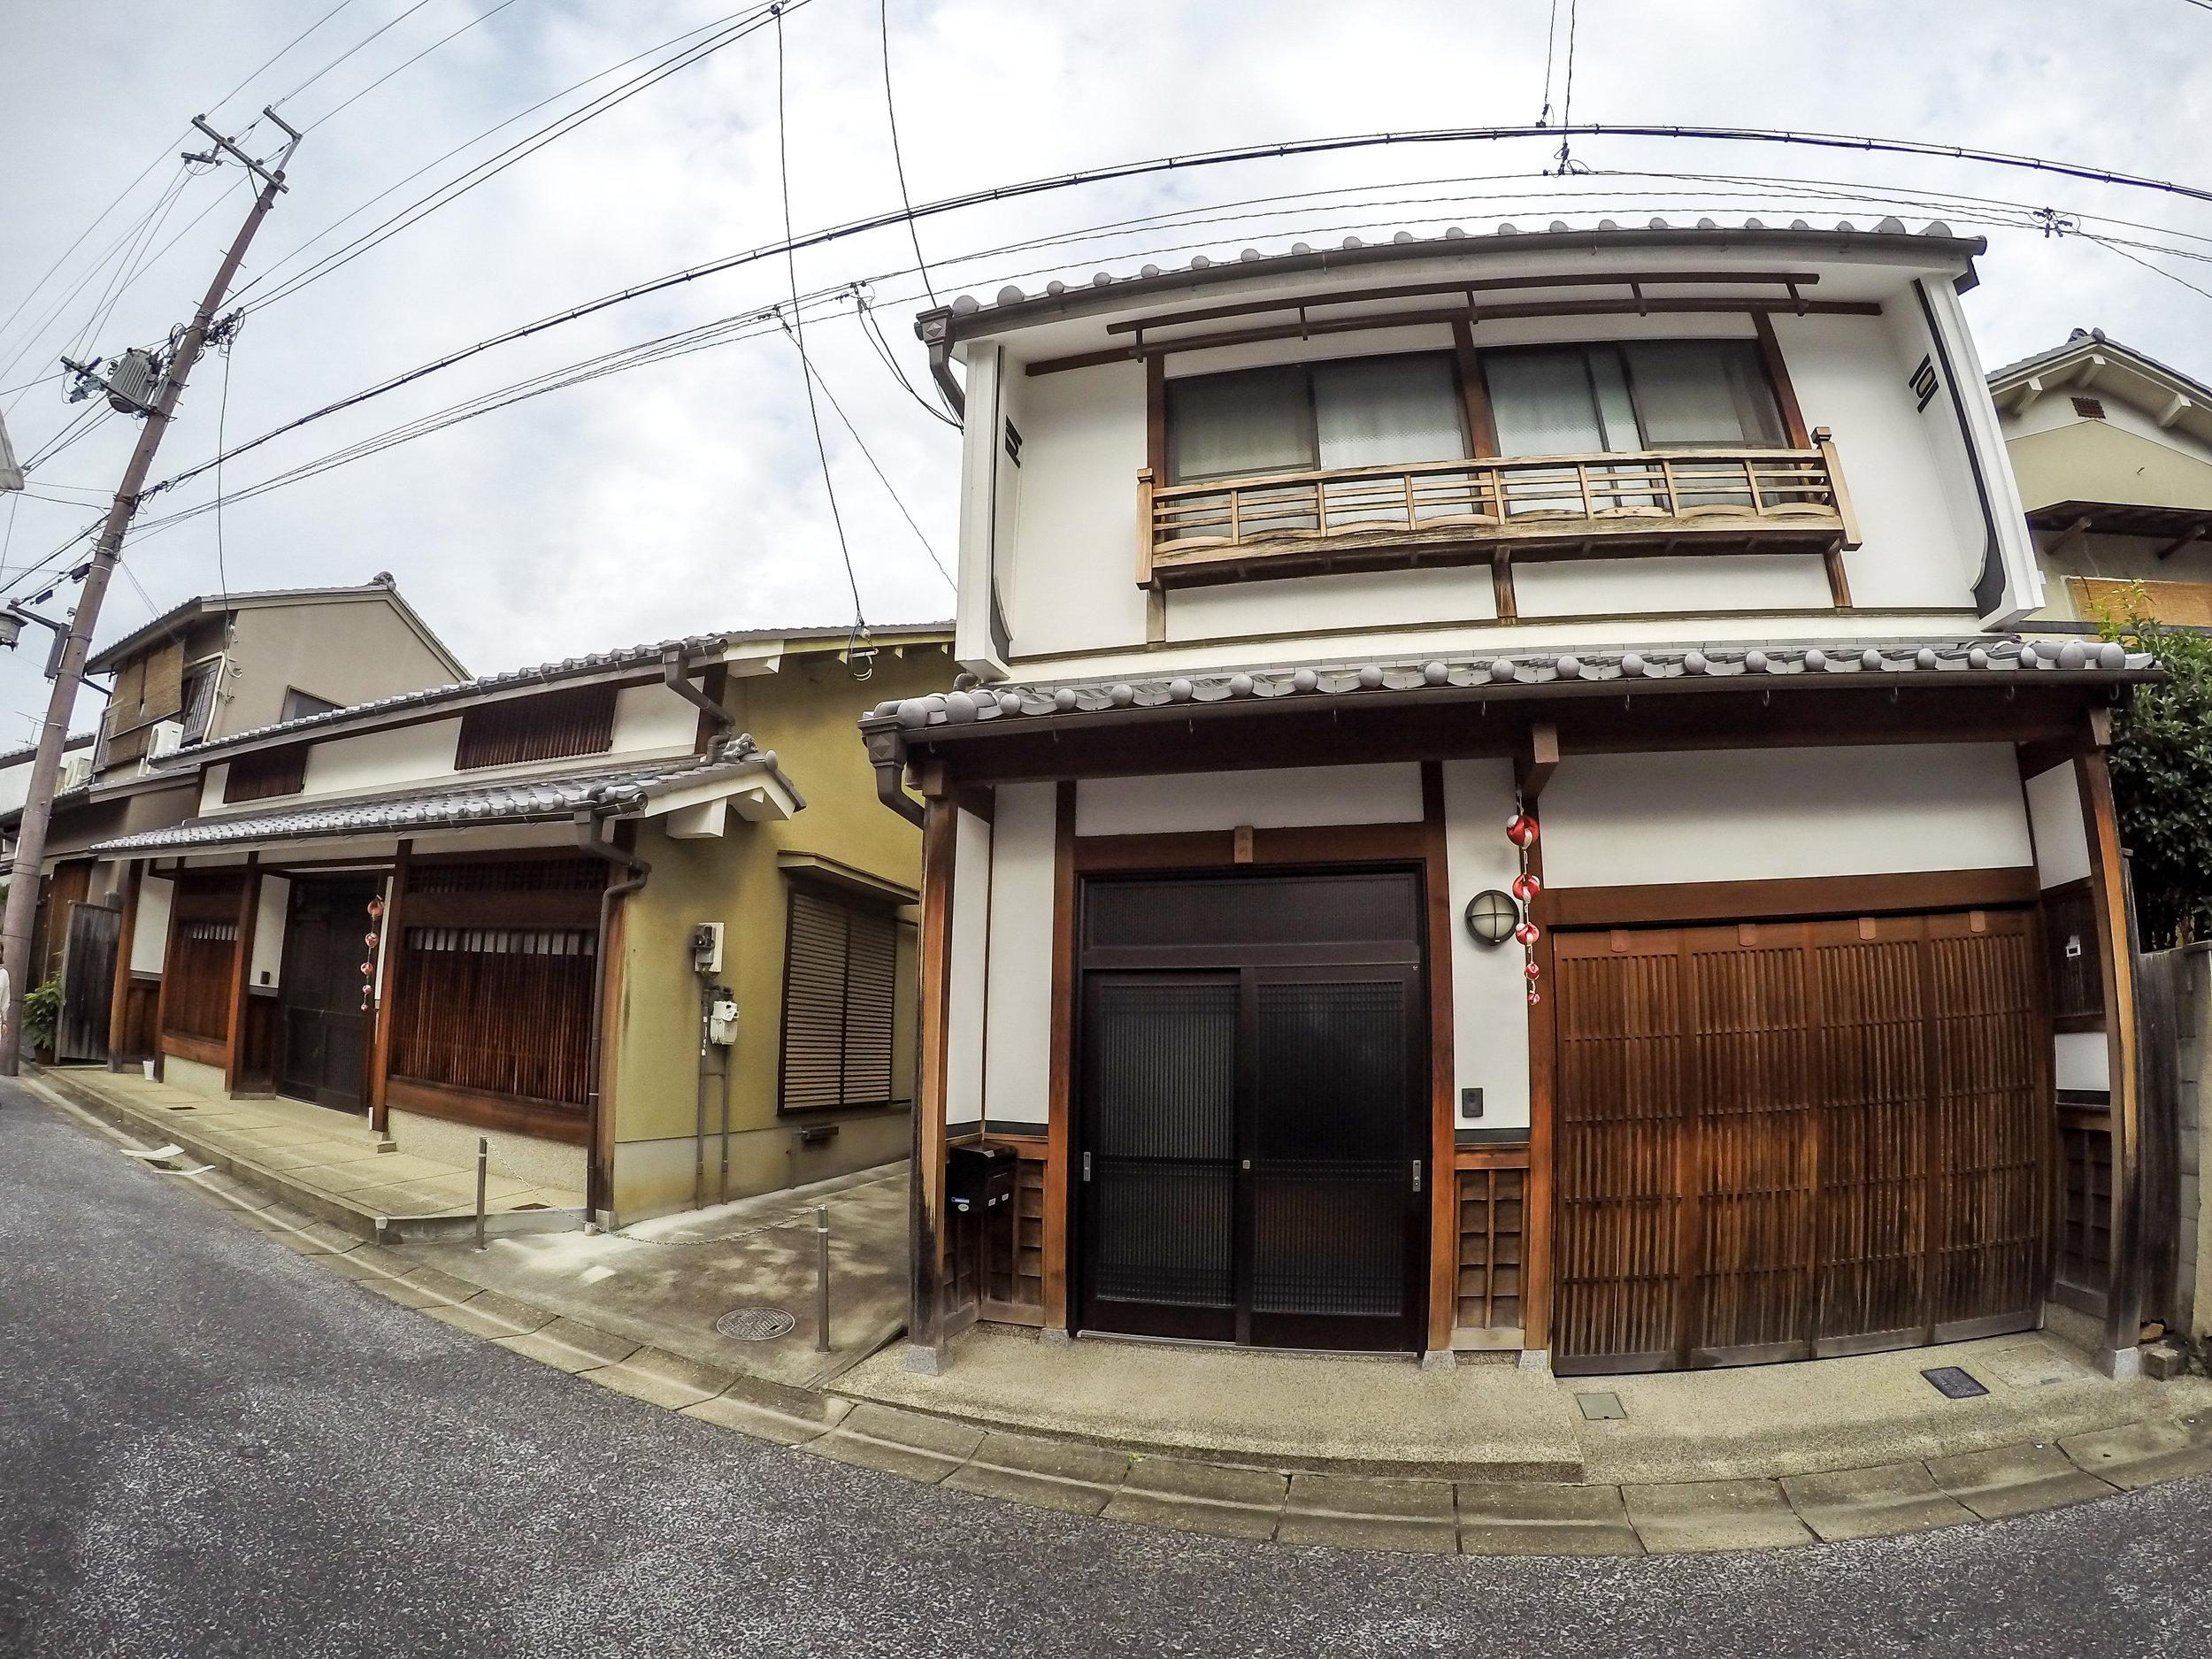 Naramachi district, Nara, Japan, Asia   DoLessGetMoreDone.com   Where Do You Feel Right At Home?